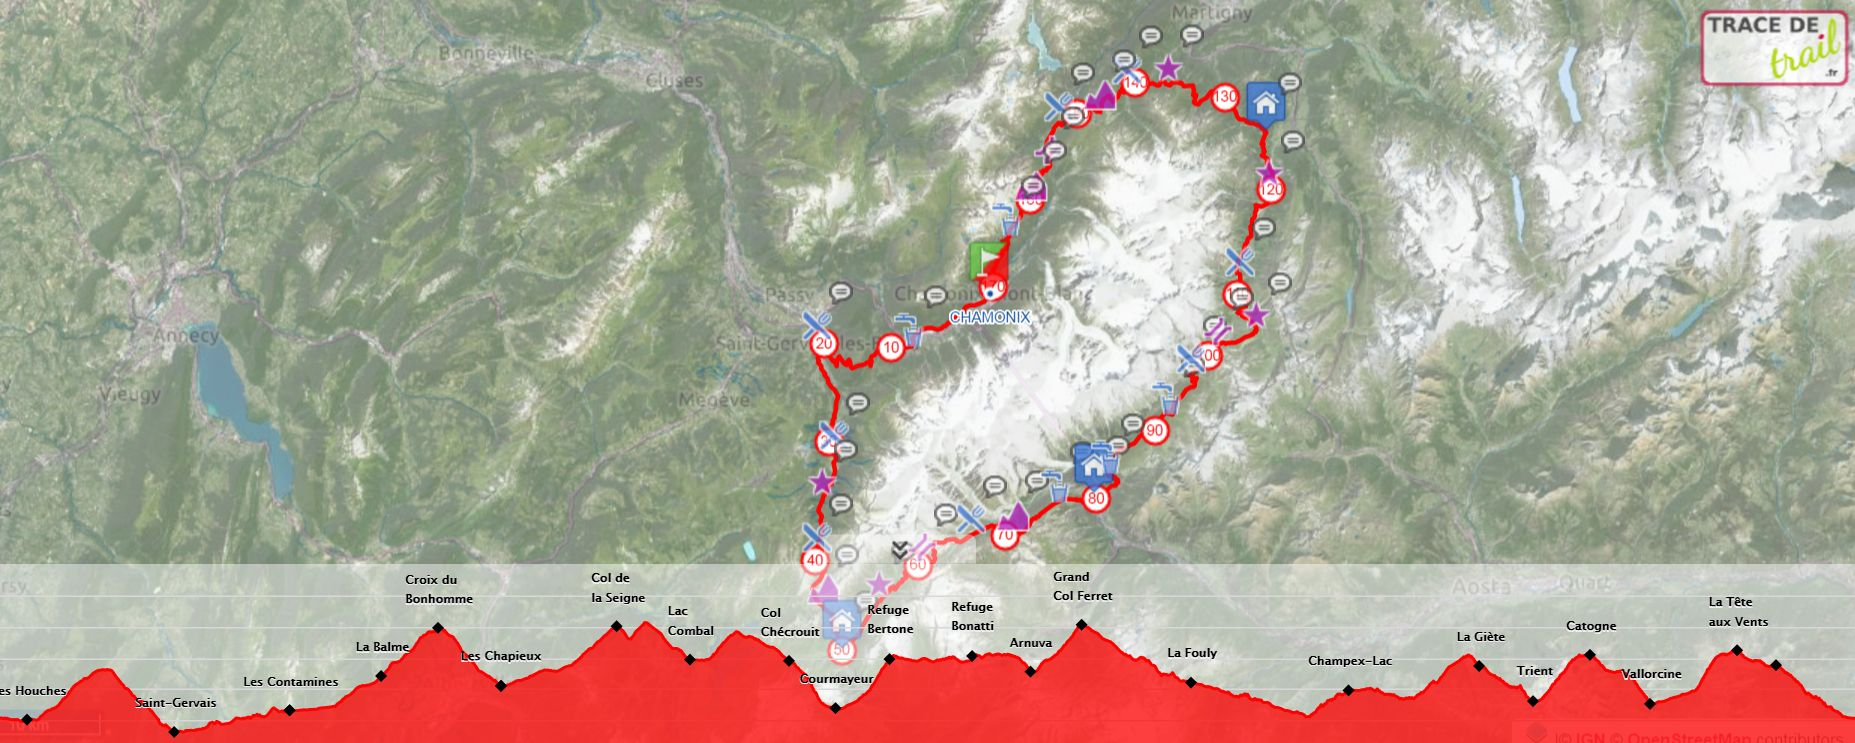 UTMB - profil trasy zawodów